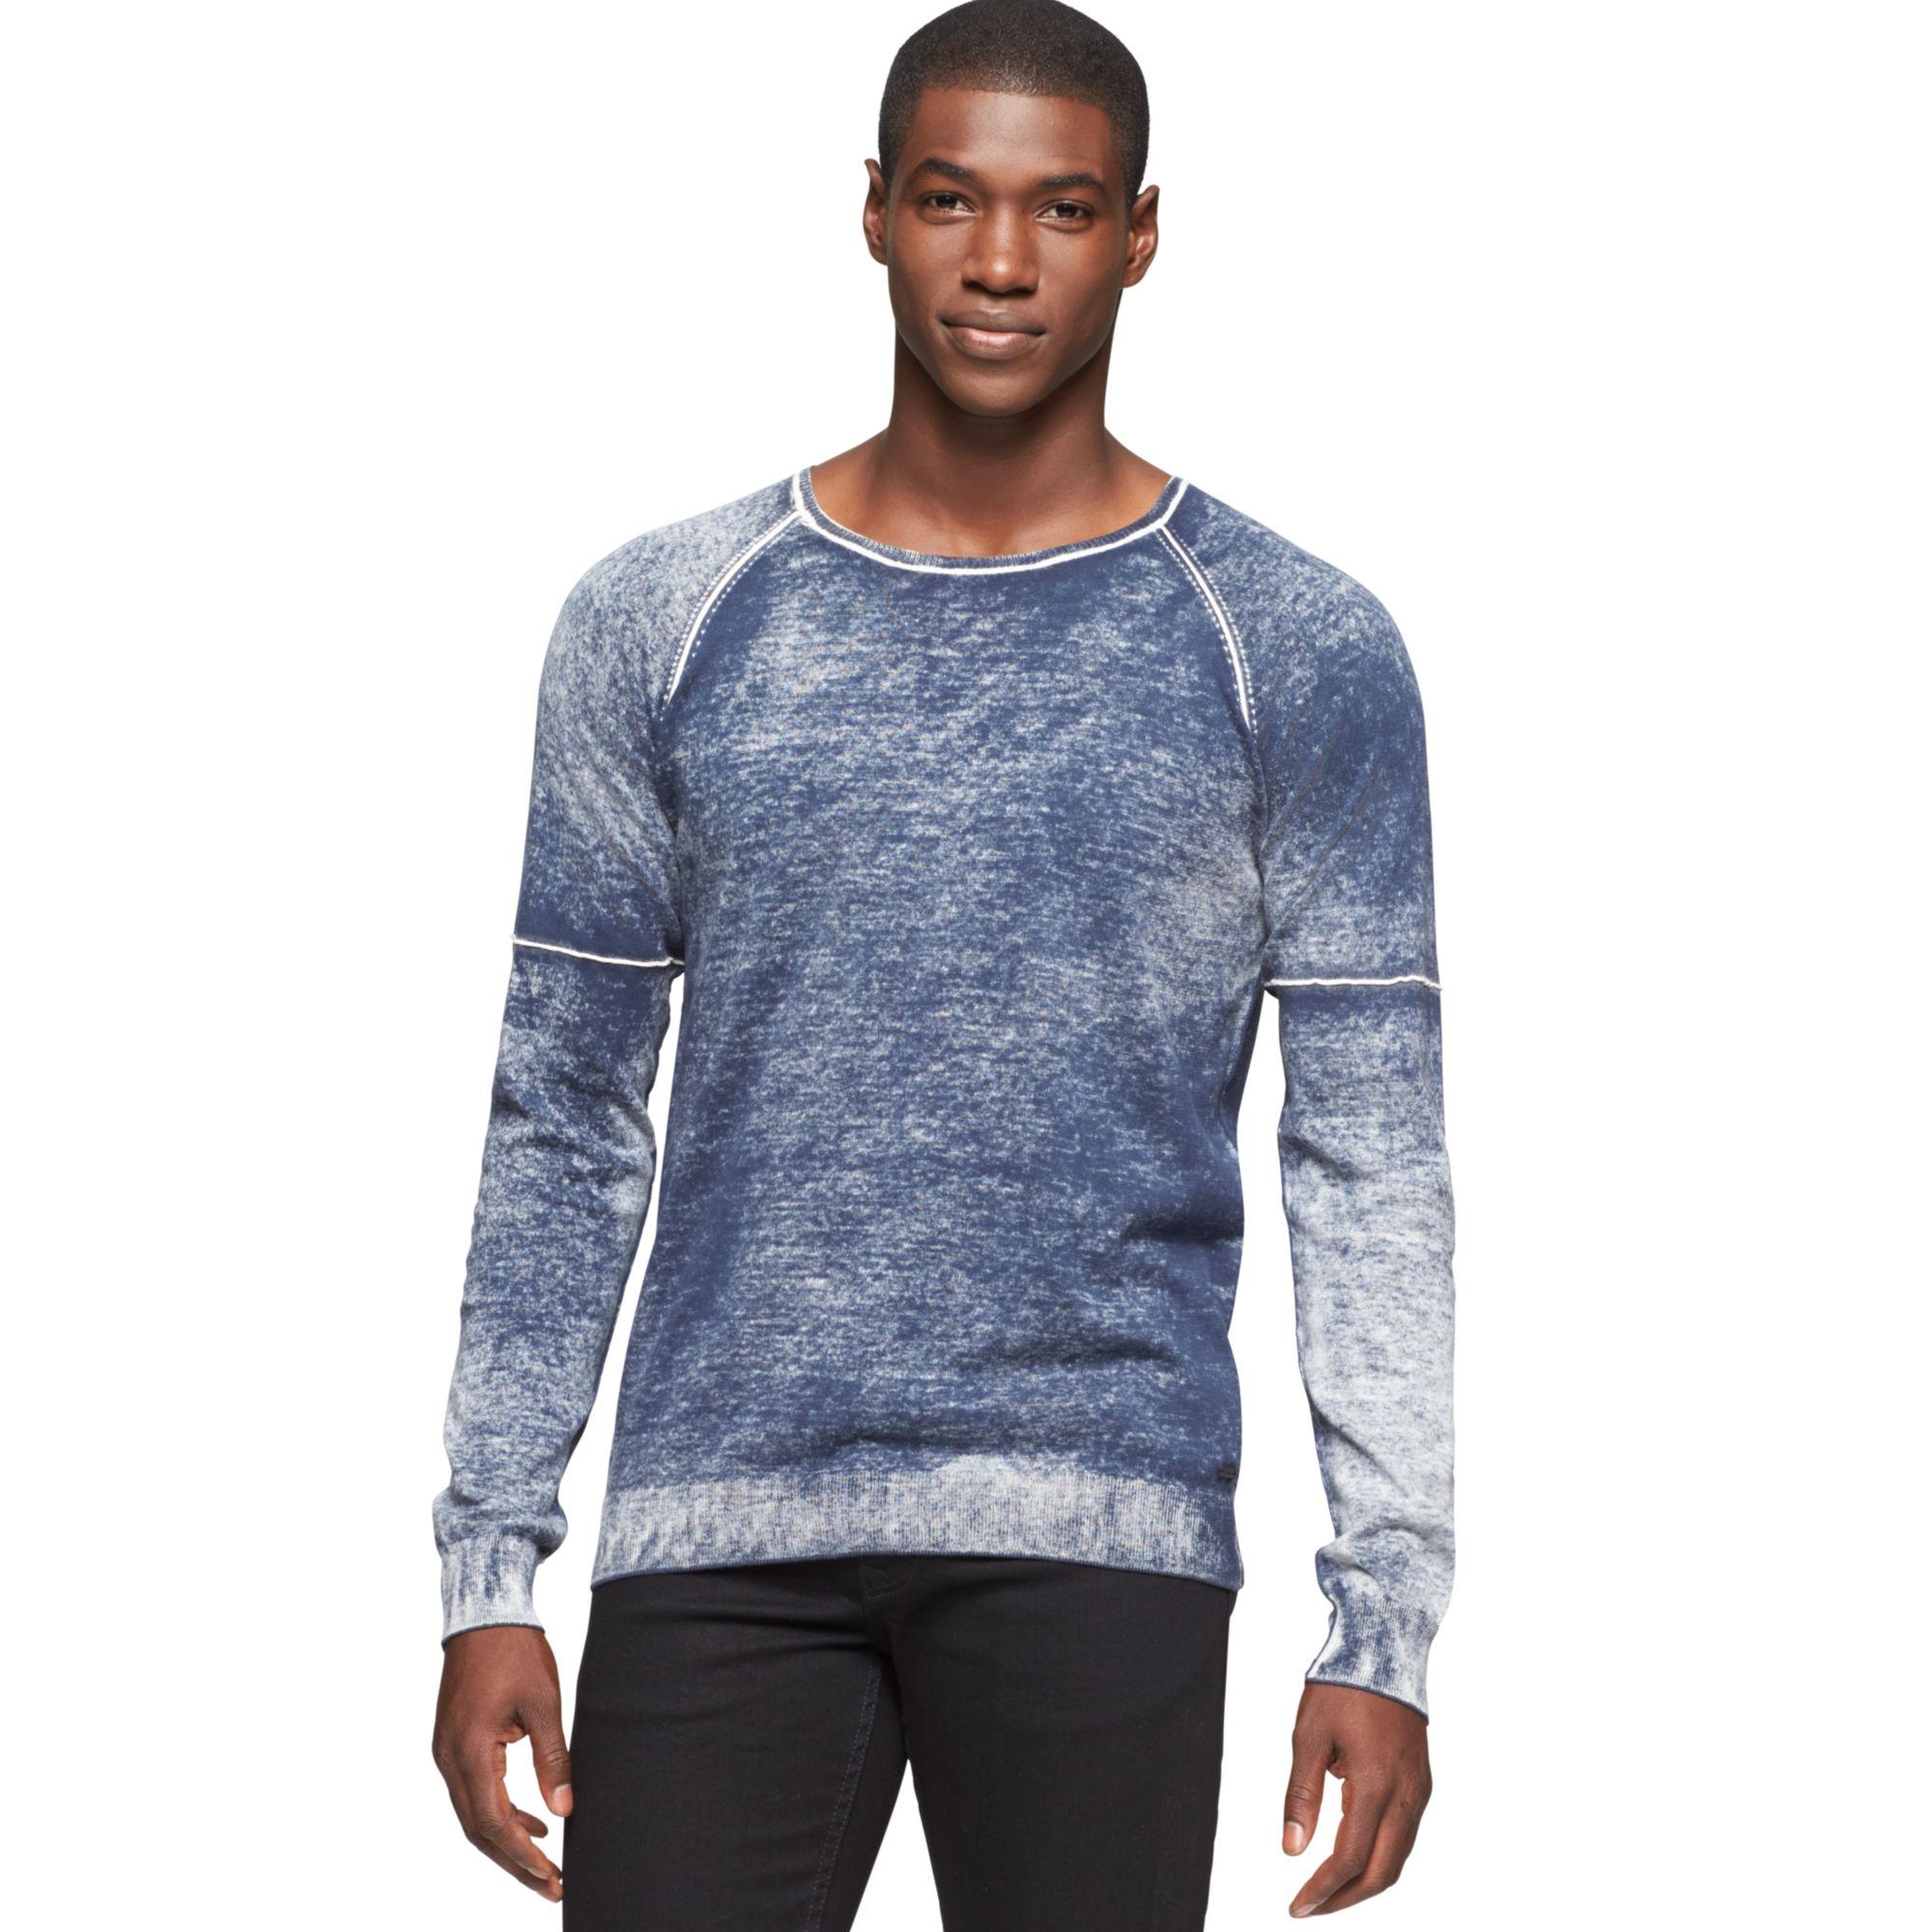 calvin klein jeans faded wash sweater in blue for men. Black Bedroom Furniture Sets. Home Design Ideas